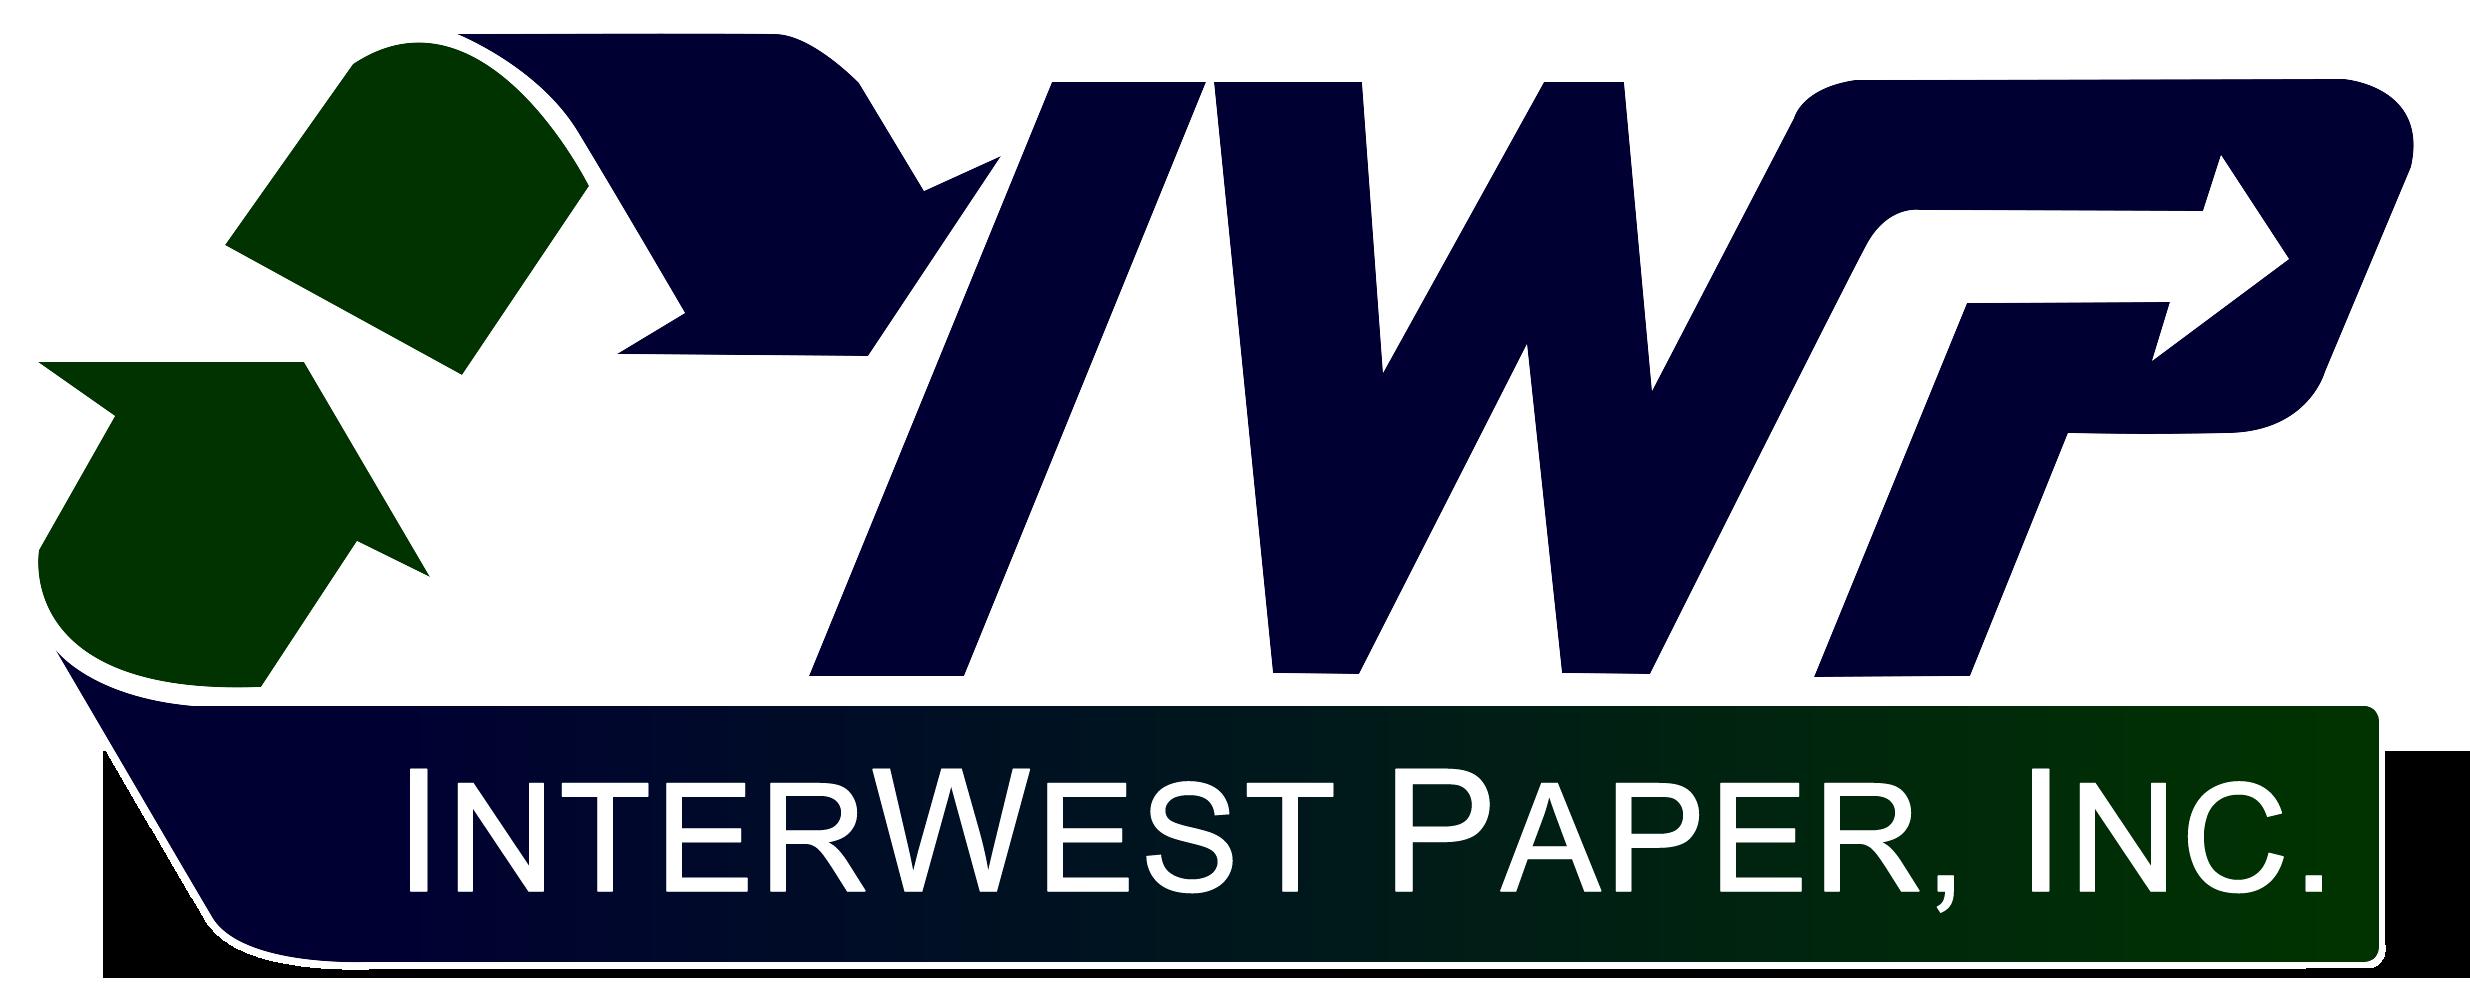 Interwest Logo White Border.png